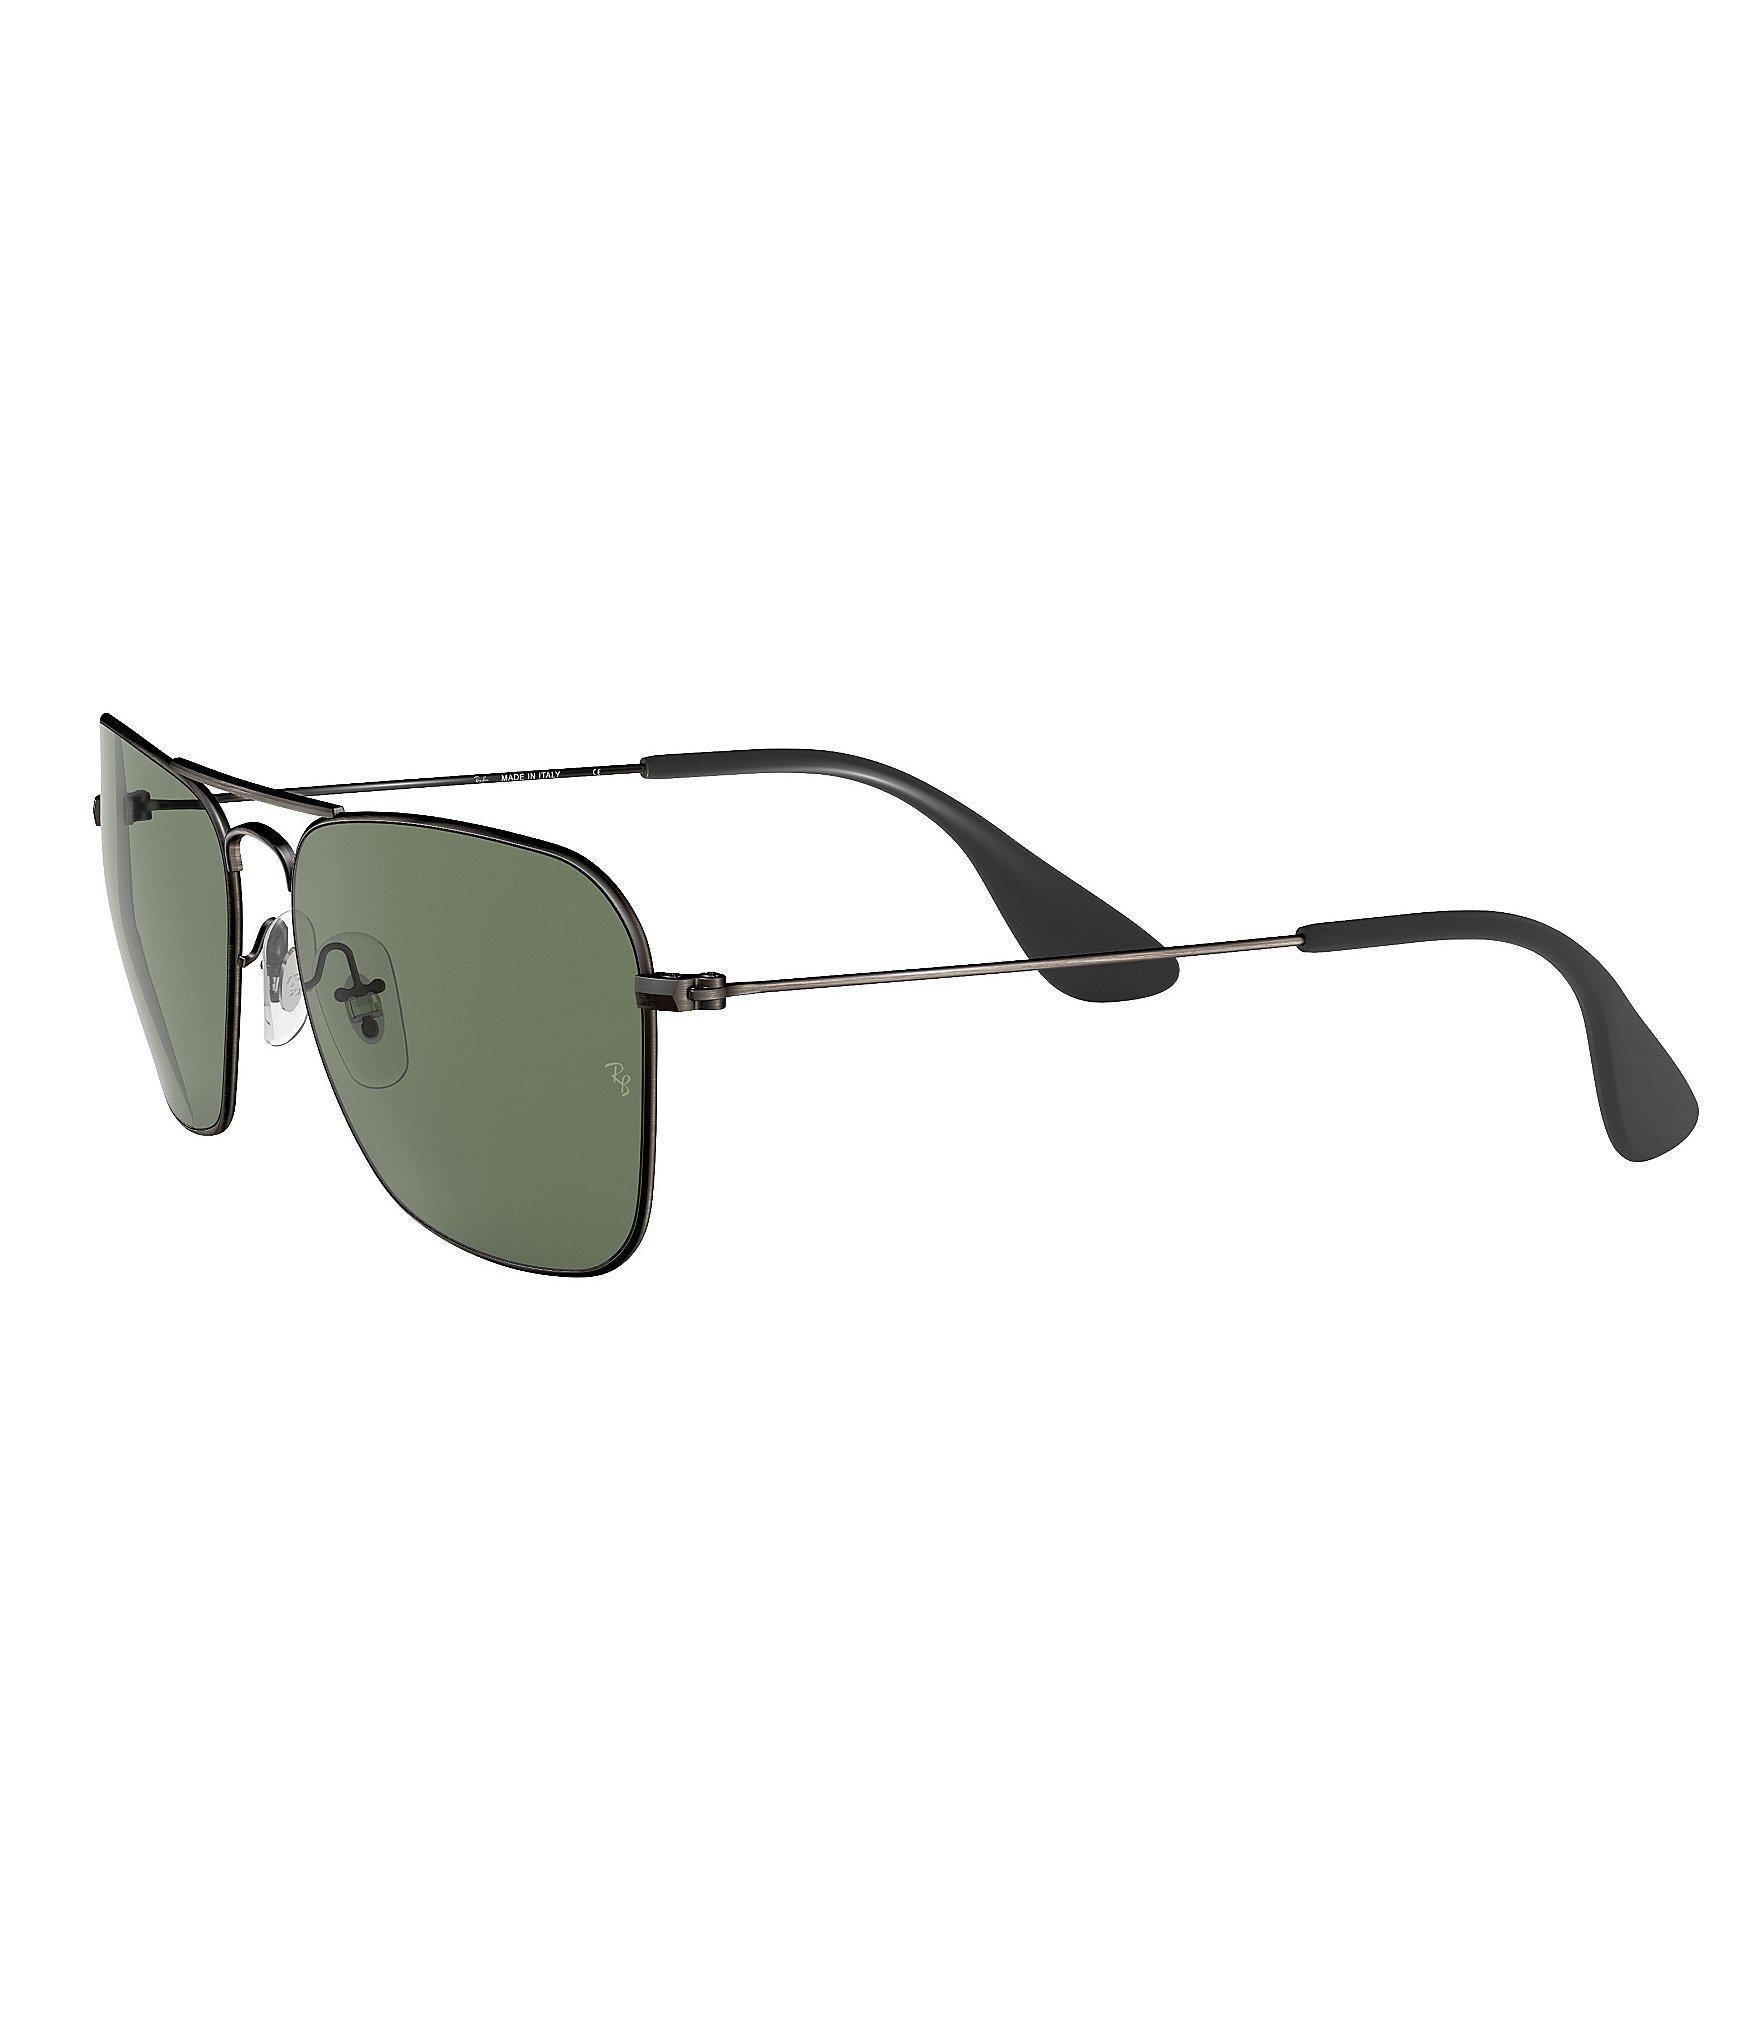 1ee01dc20c Ray-Ban - Green Navigator Sunglasses for Men - Lyst. View fullscreen